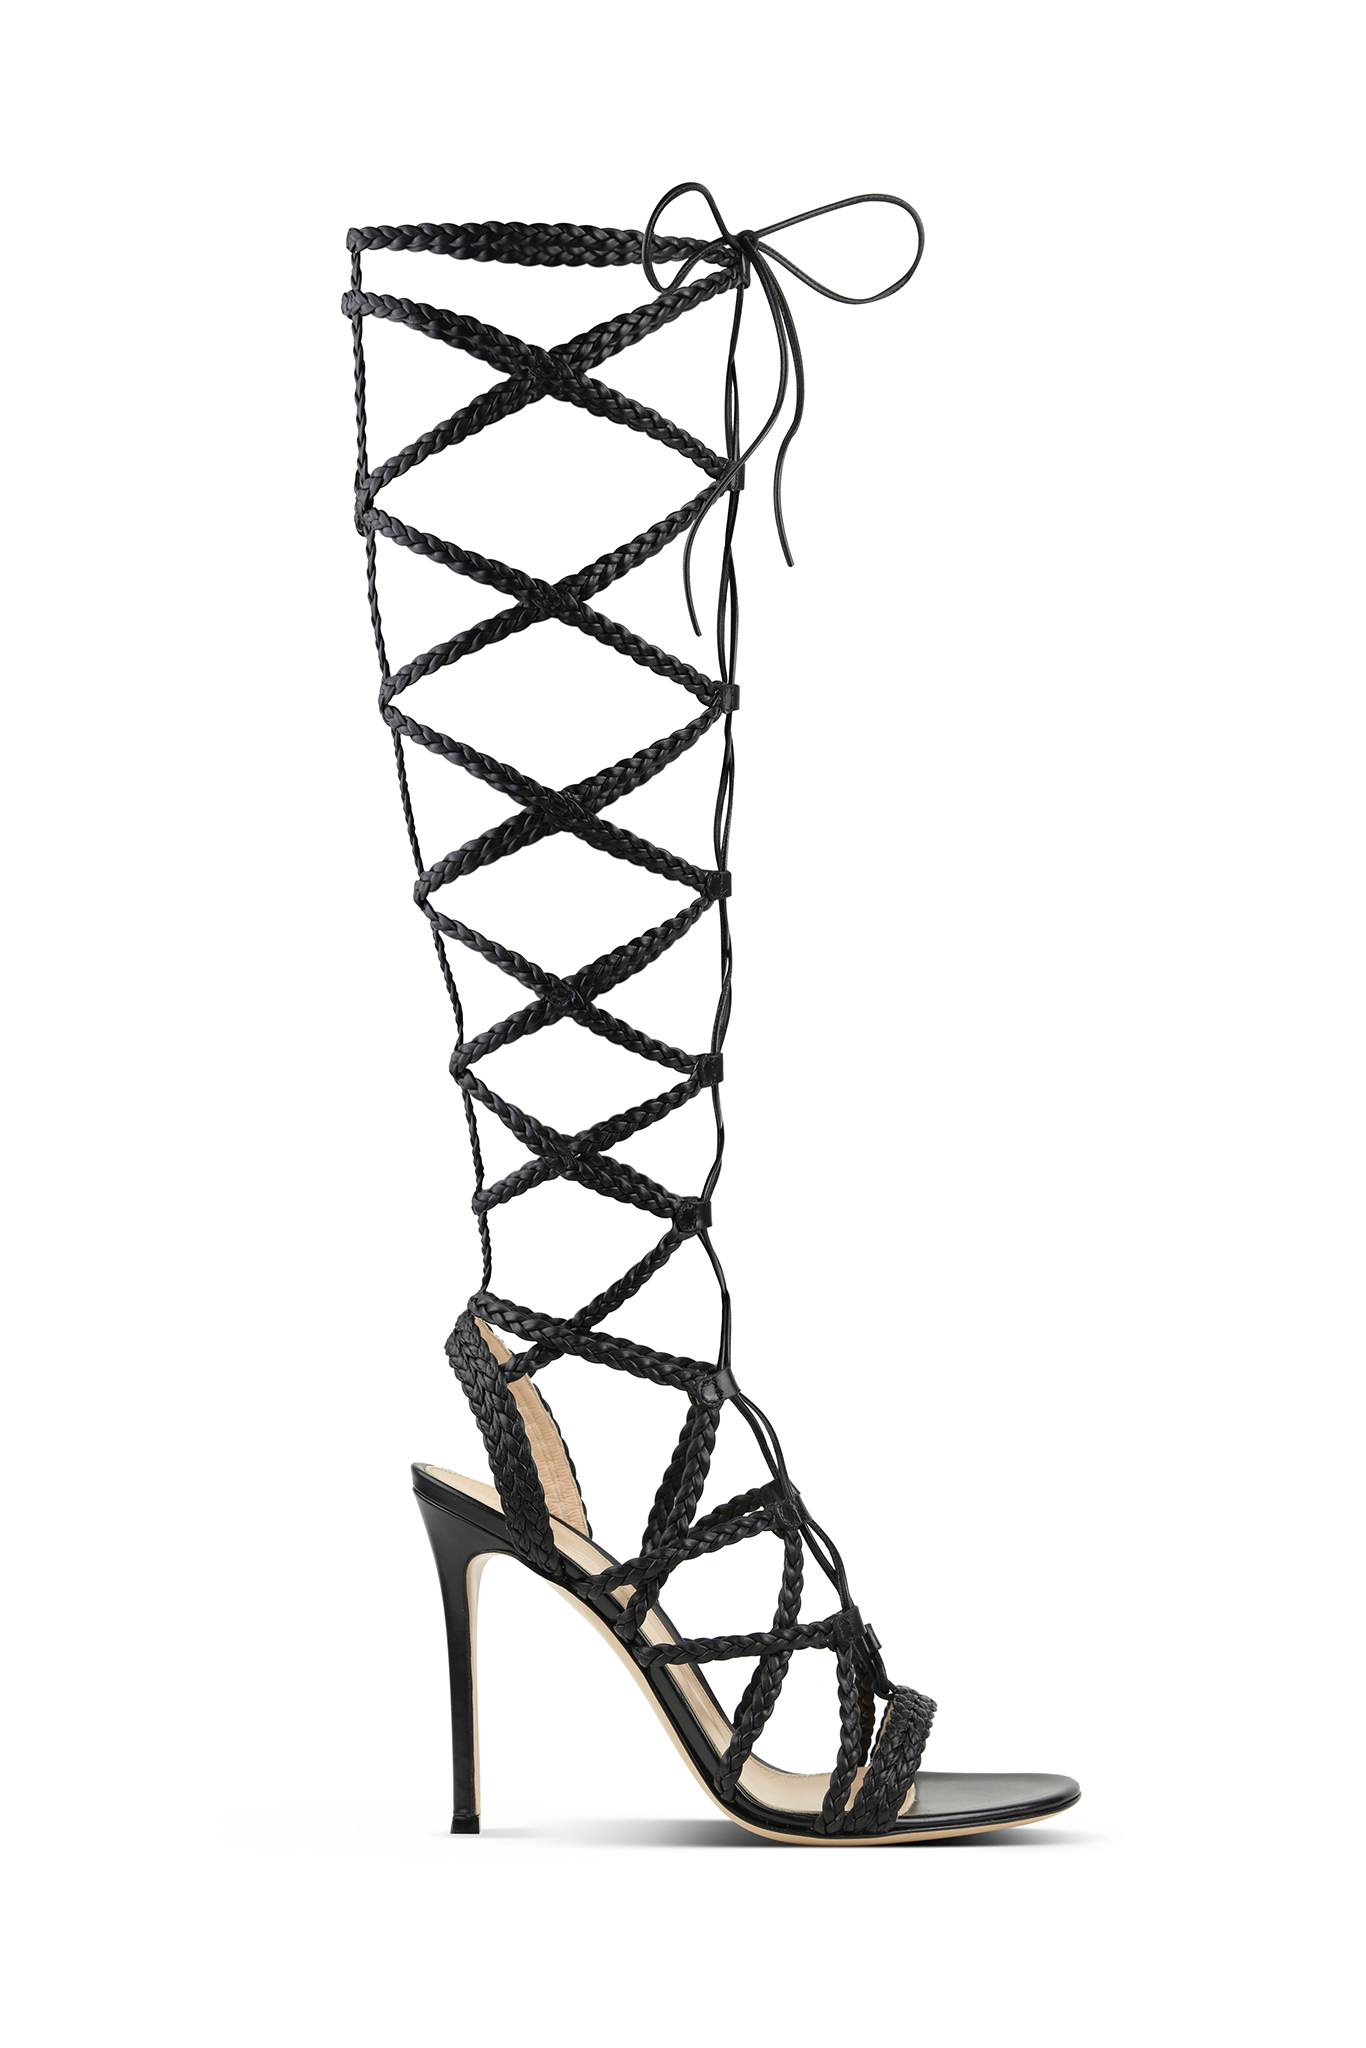 03-03-heeled-gladiator.jpg